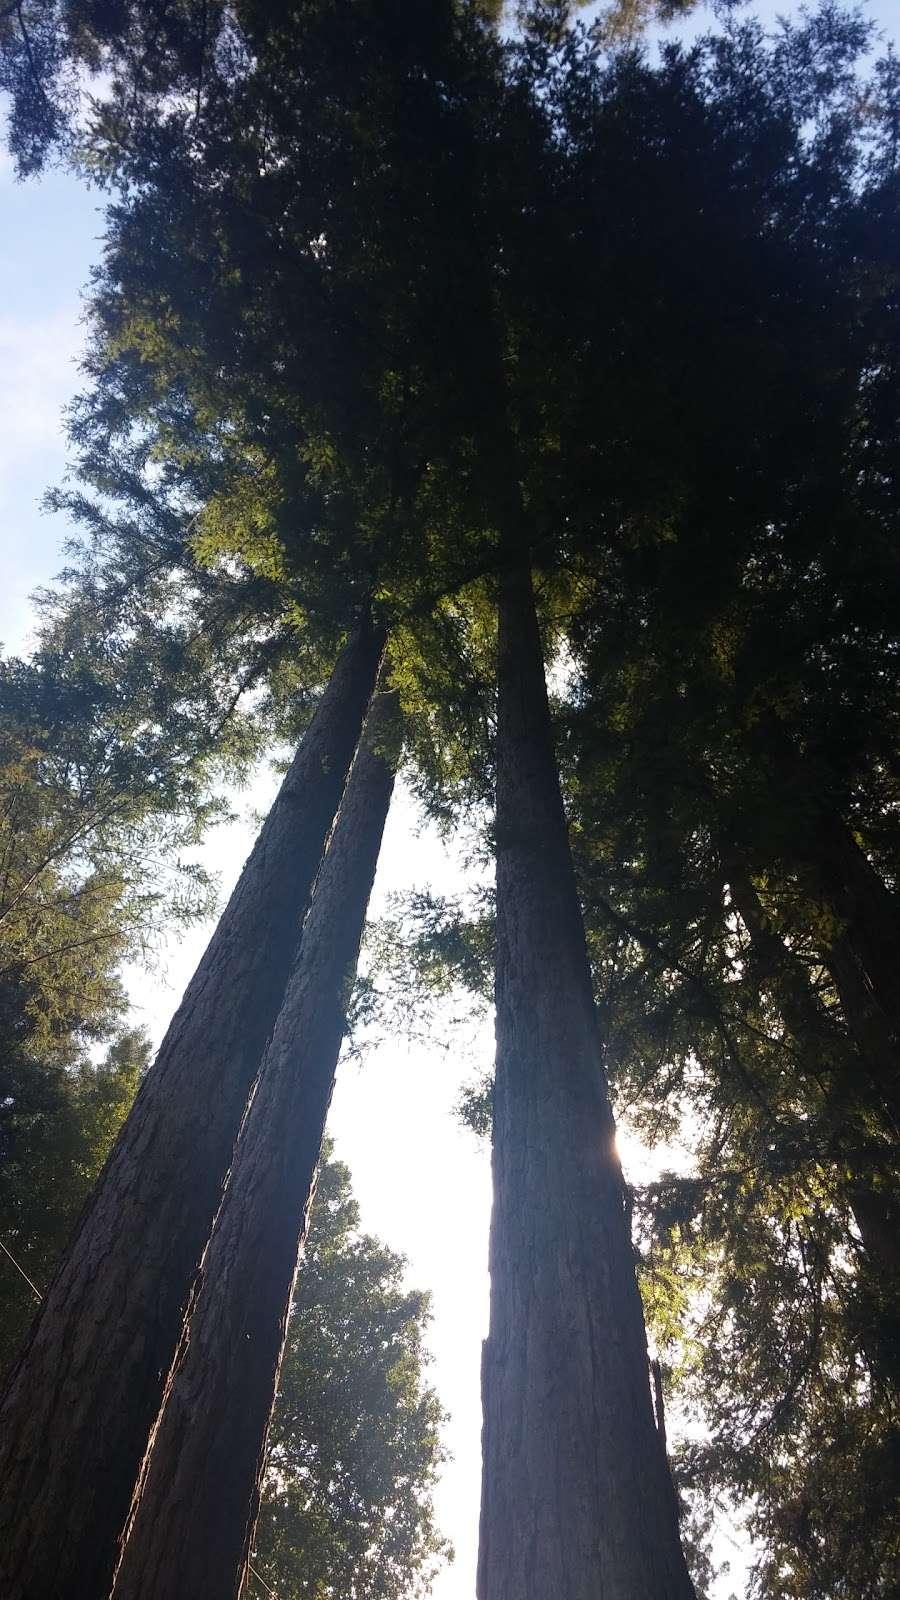 Forest Springs Improvement & Maintenance - park  | Photo 5 of 5 | Address: 401 Acorn Dr, Boulder Creek, CA 95006, USA | Phone: (831) 338-7134